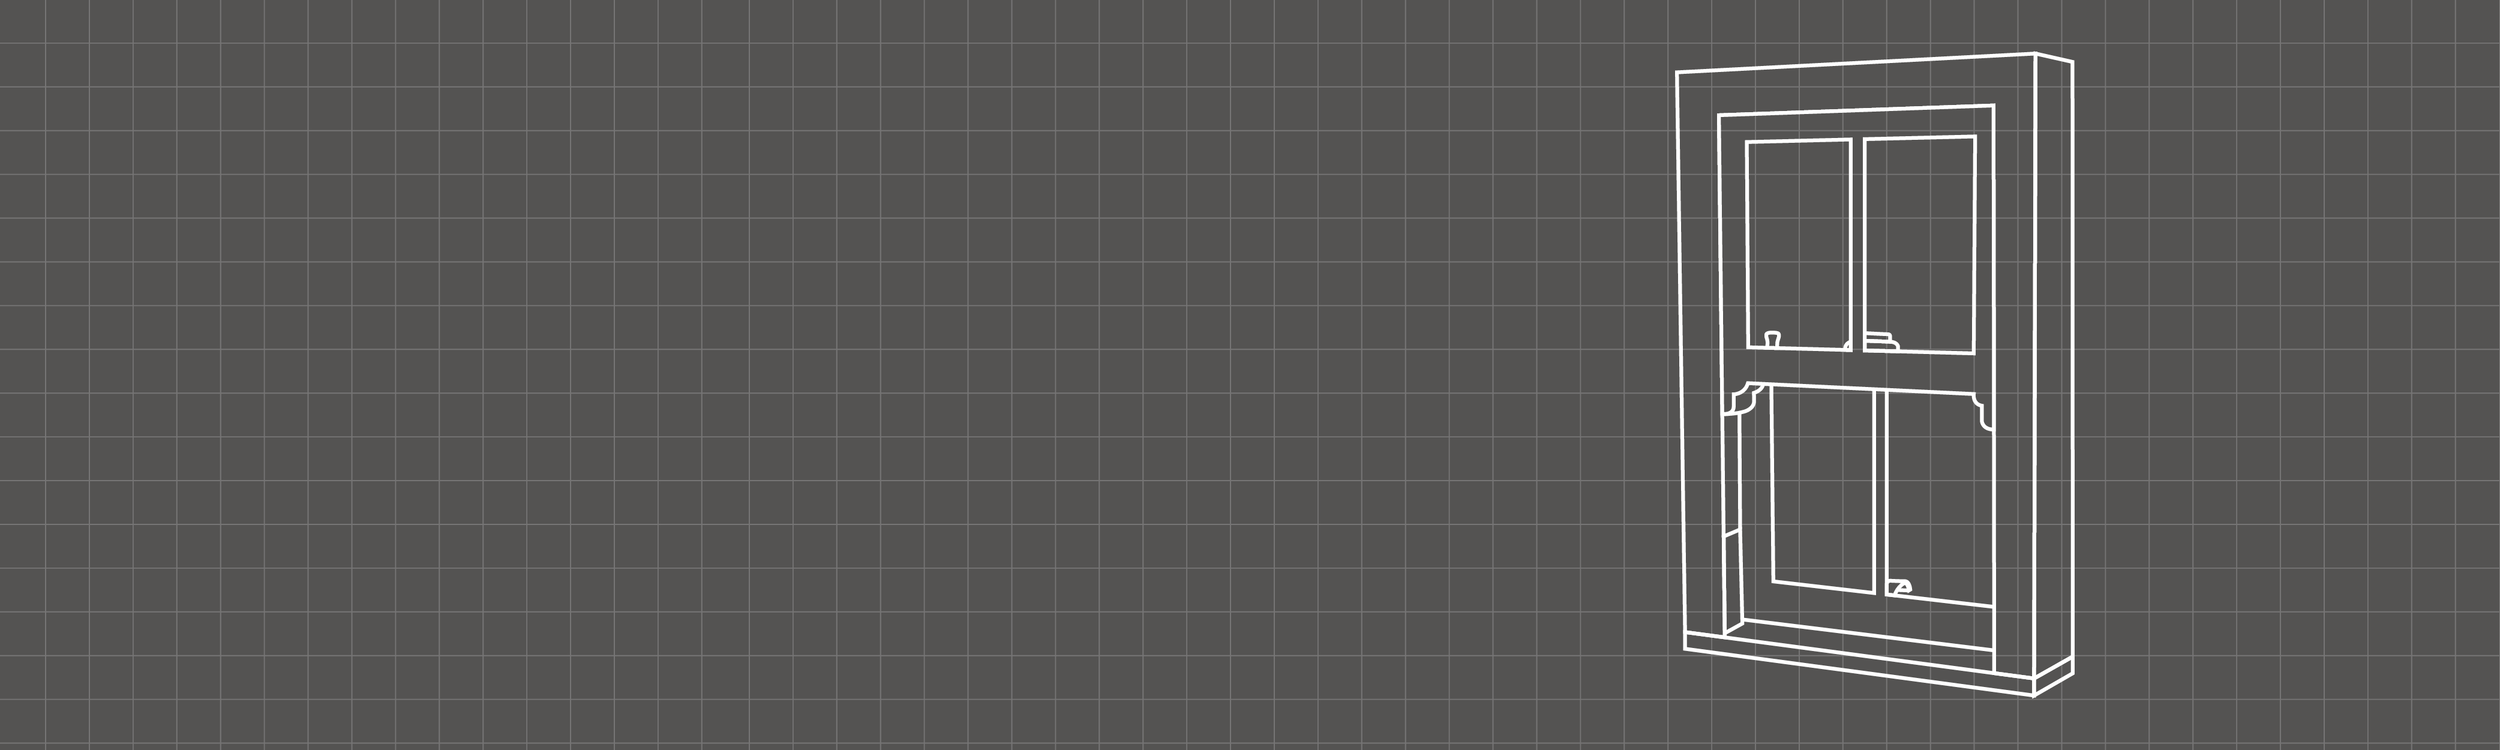 Sash/Vertical Sliders -